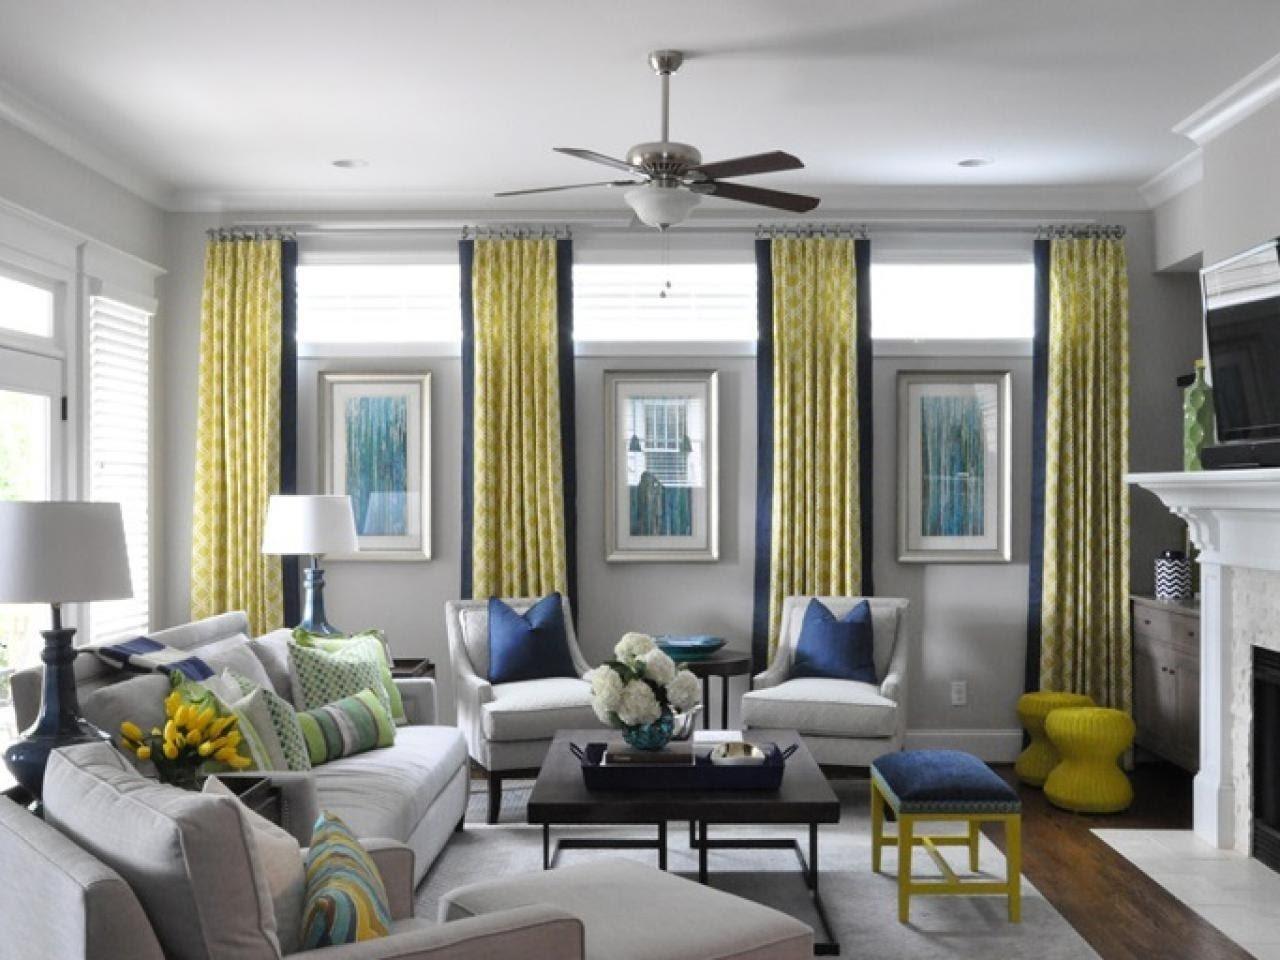 10 Cute Living Room Window Treatment Ideas awesome window treatment ideas for living room youtube 2021